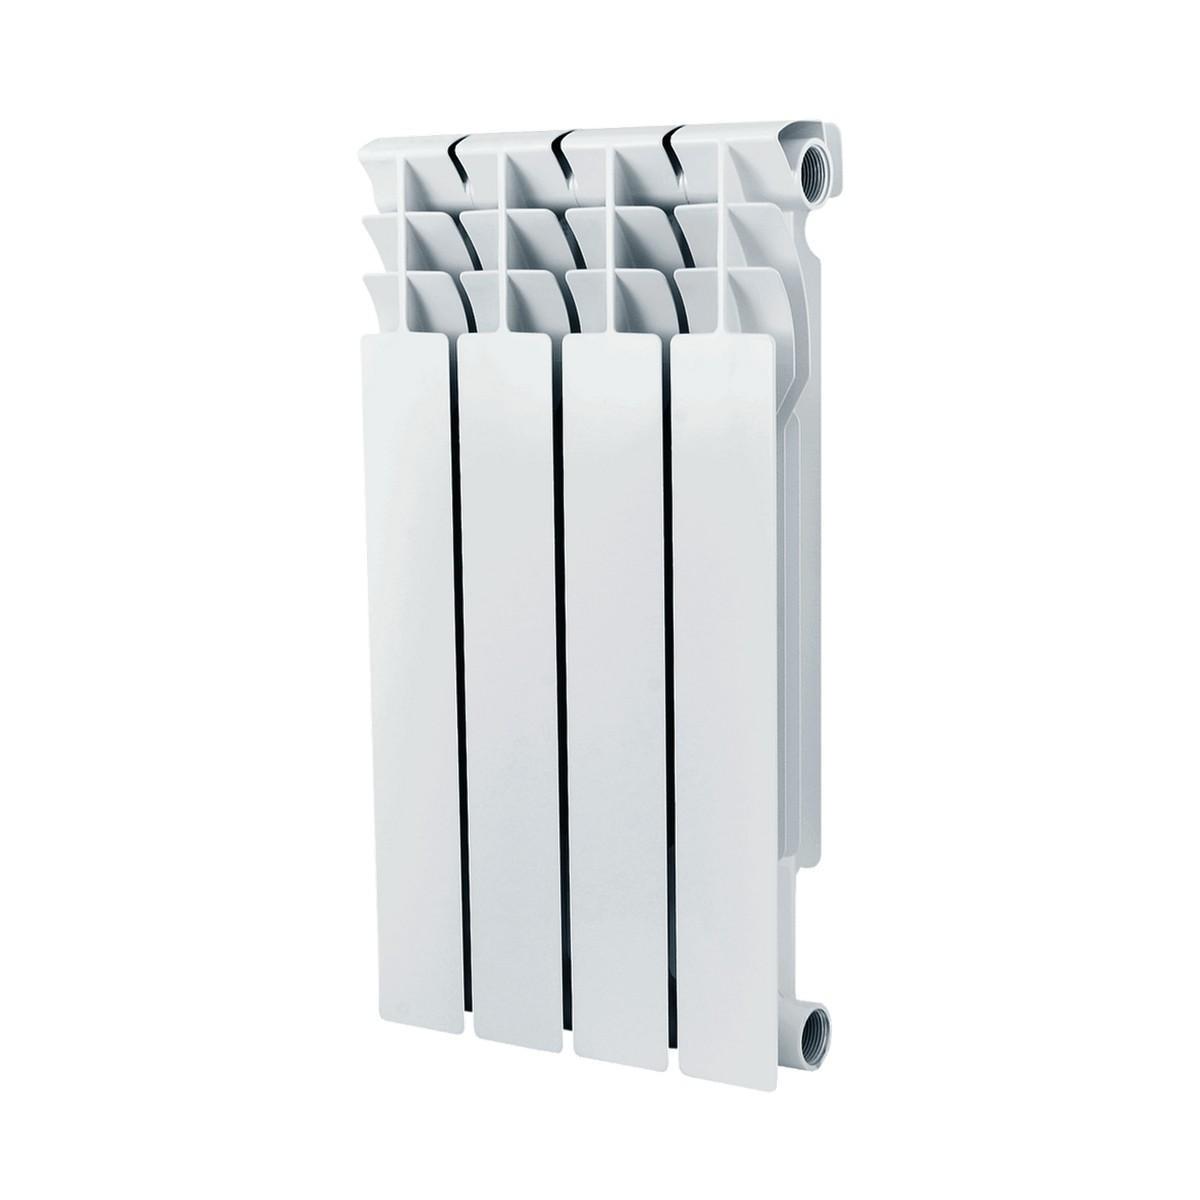 Радиатор биметалл Ultra Plus 350 7 секций Ogint  117-5983